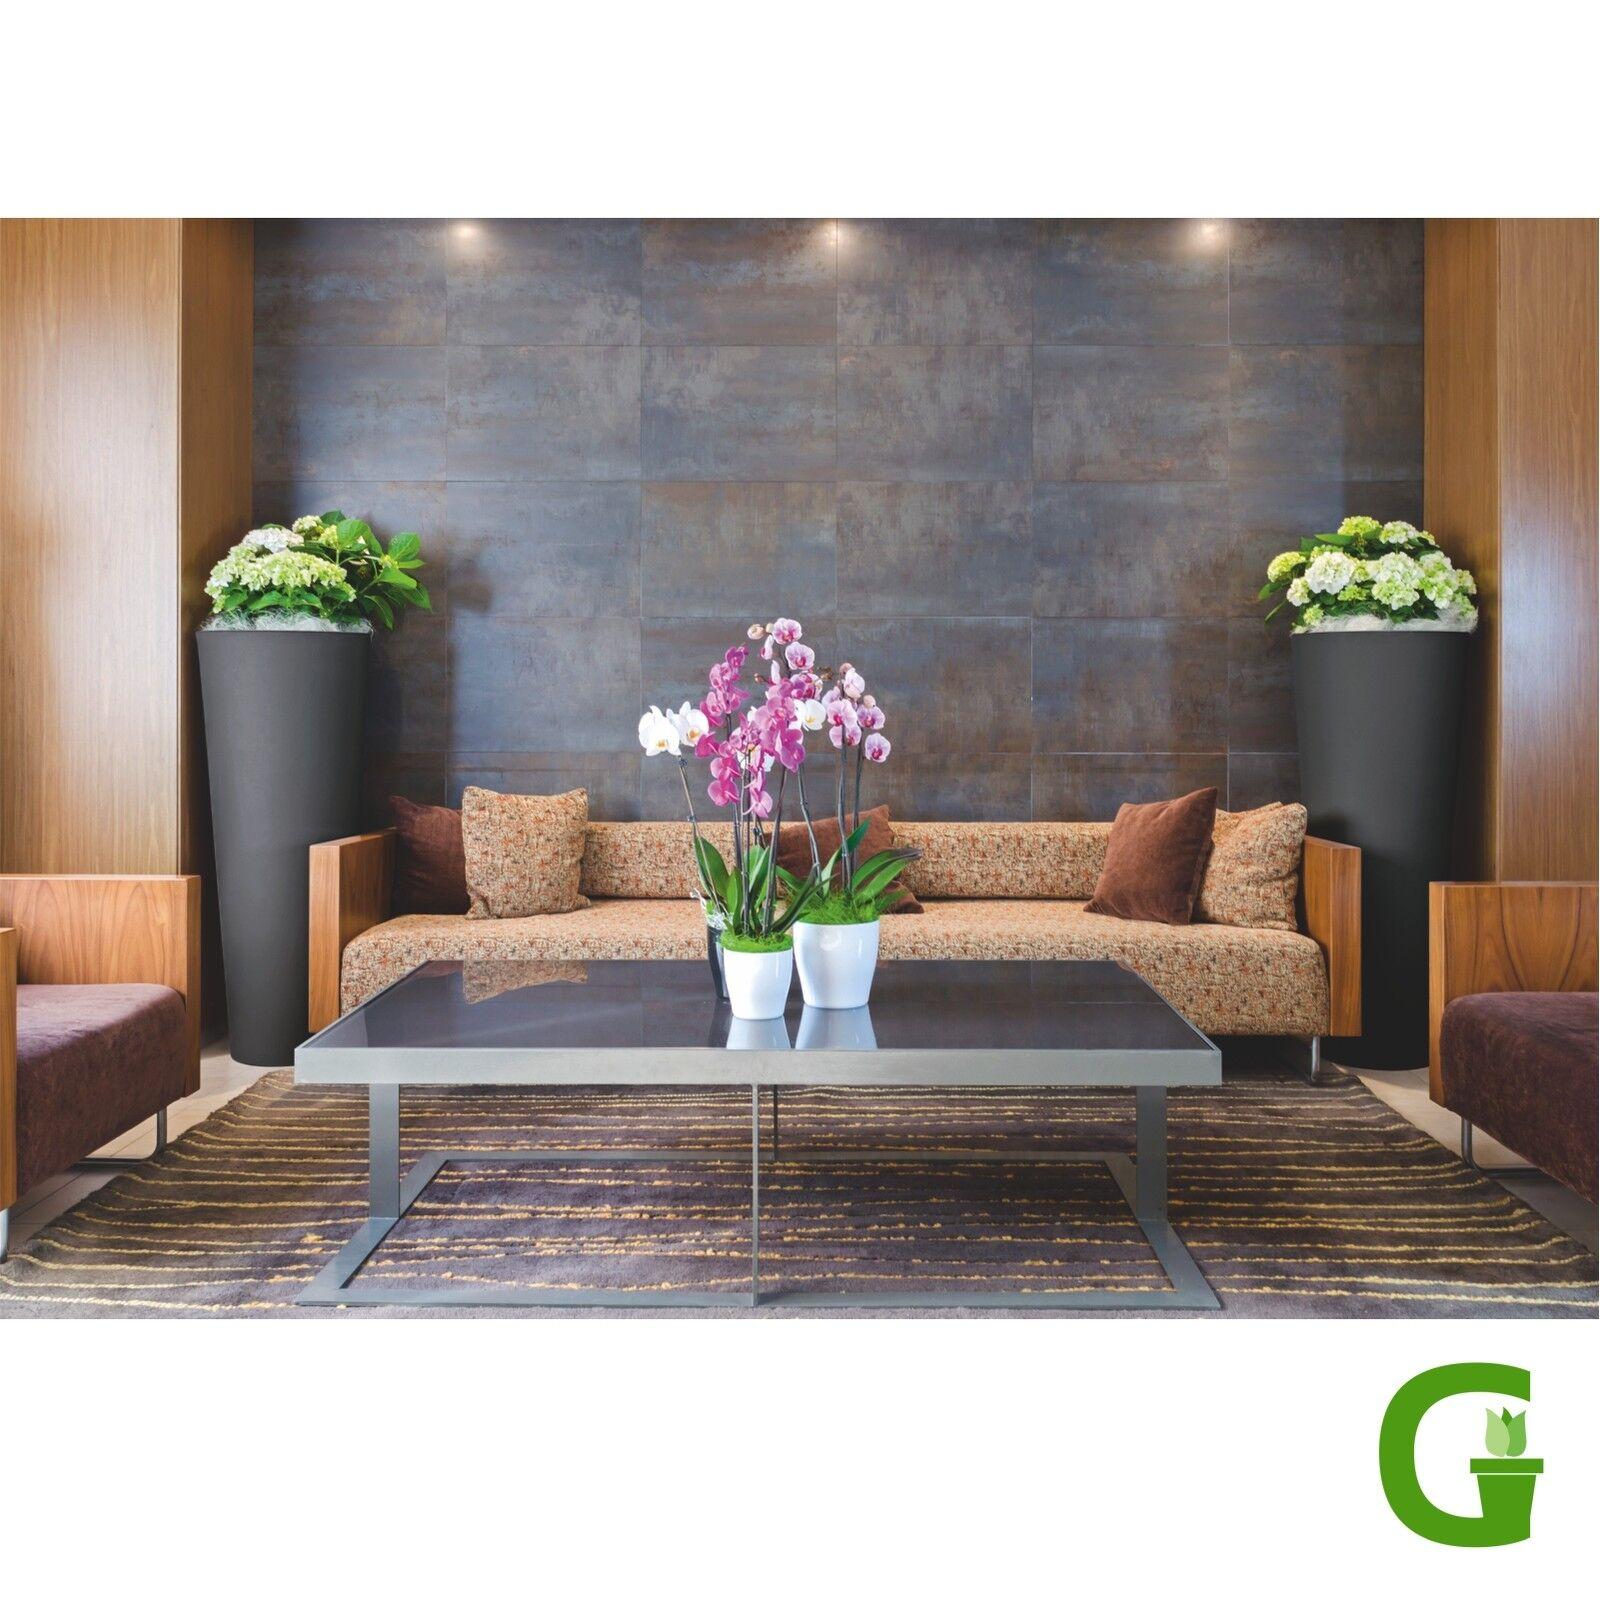 toscana pflanztopf 100 cm hoch pflanzk bel kunststoff. Black Bedroom Furniture Sets. Home Design Ideas